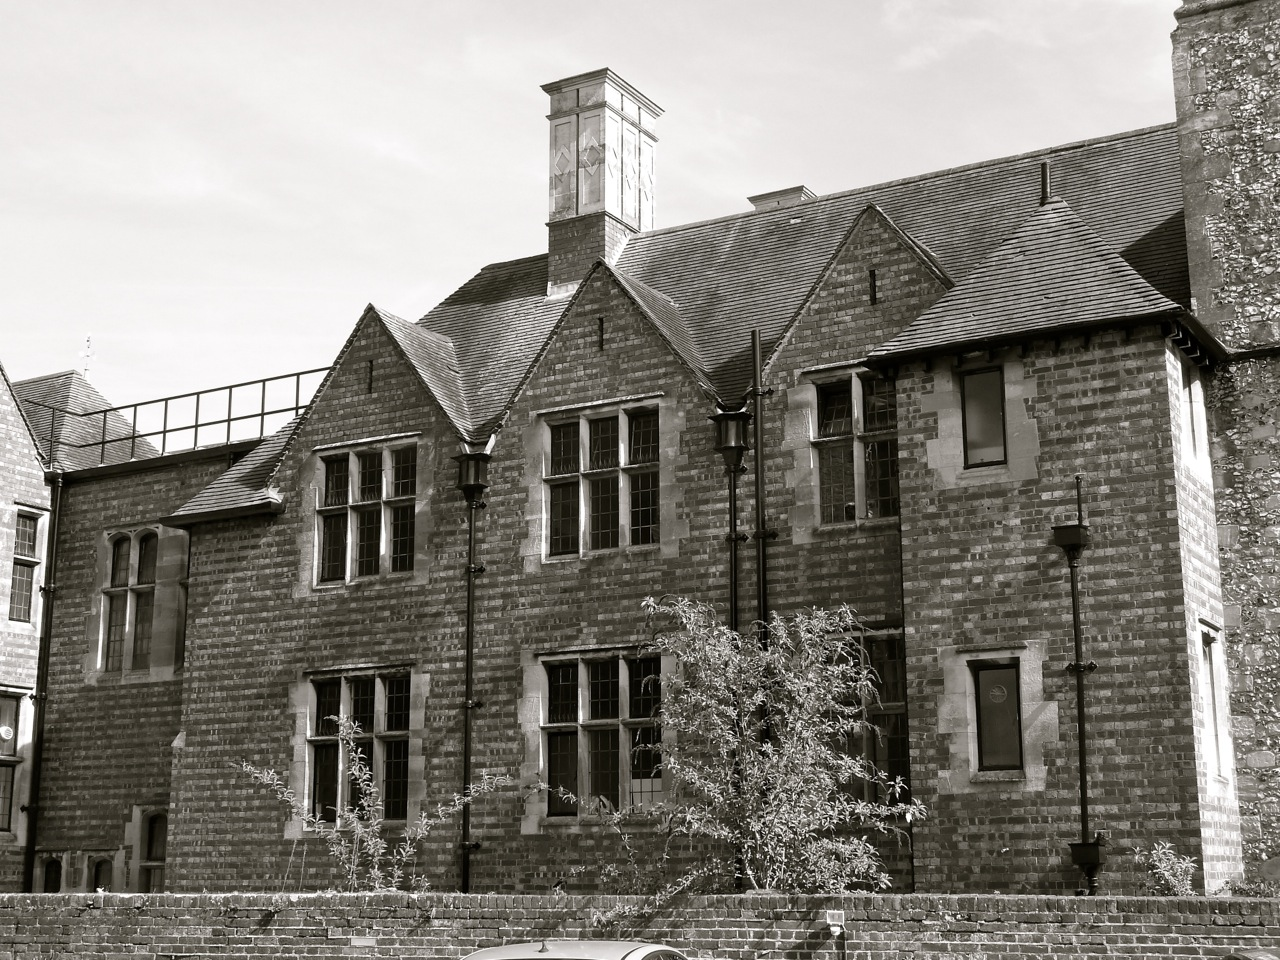 winchester architecture peninsular square and castle